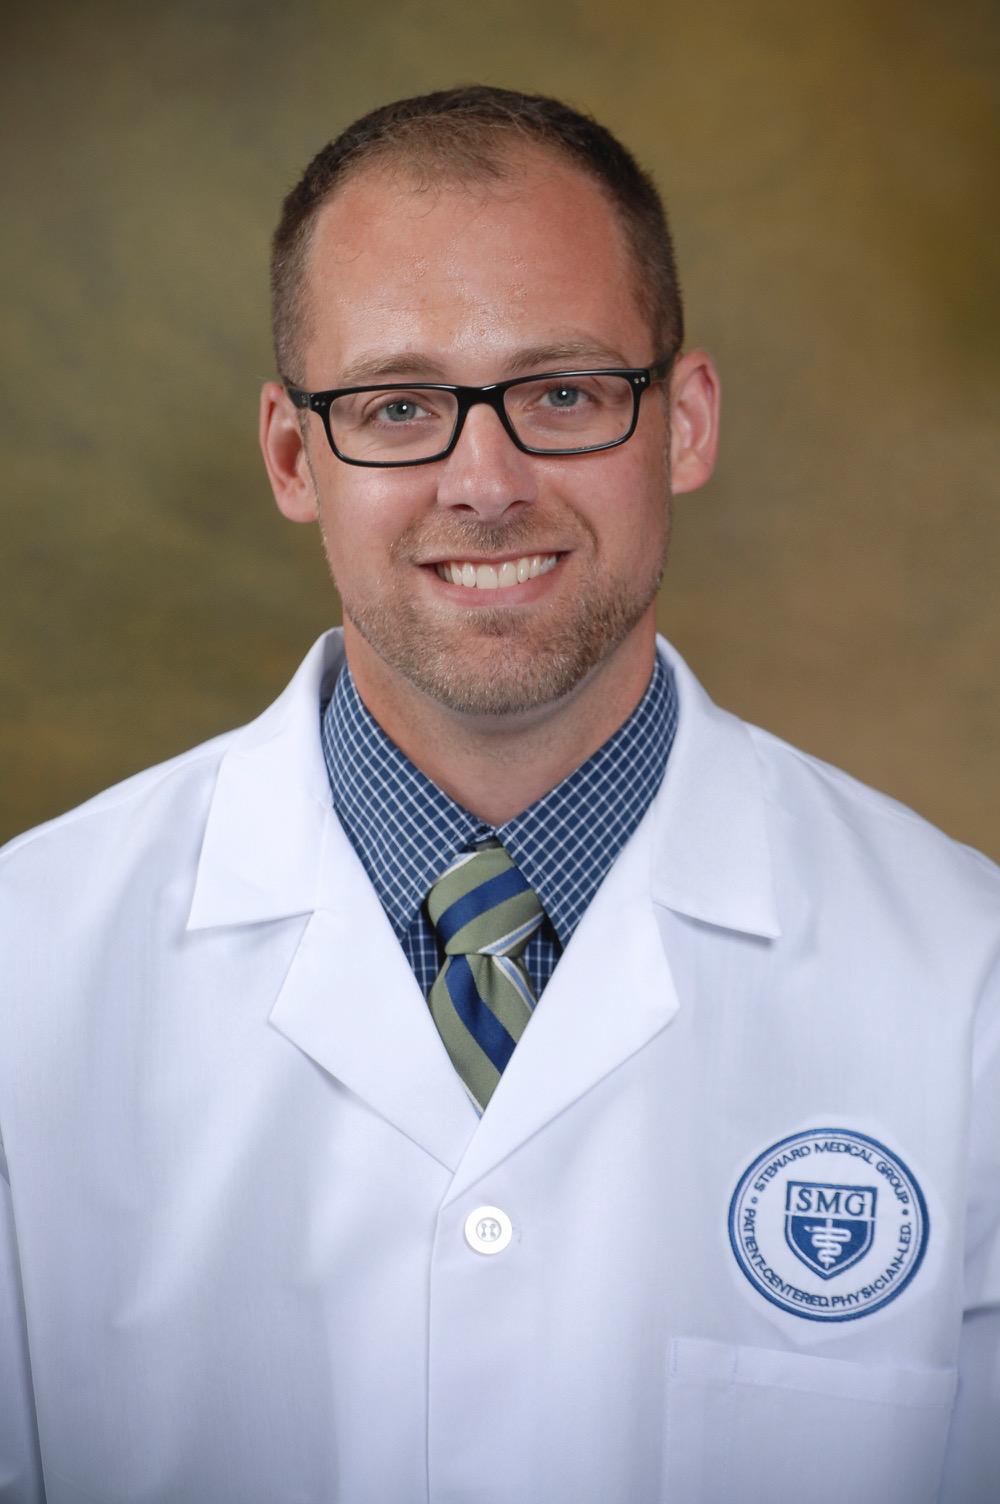 Dr. Brandon Weeks, Physical Medicine and Rehabilitation Physician